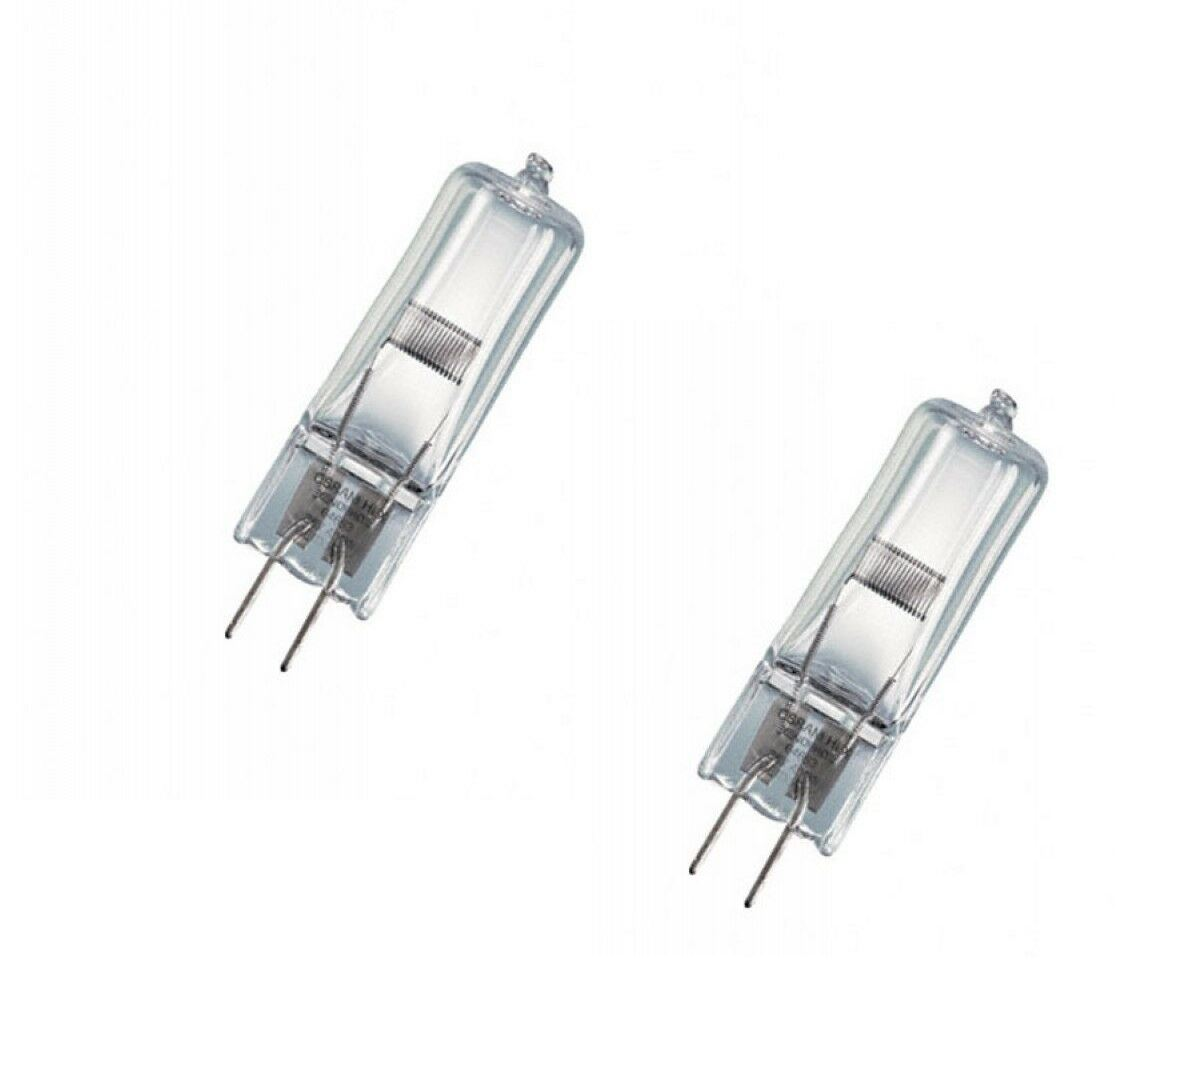 For 21V150W G6.35 Halogen Cup Lamp Medical Education Special Instrument